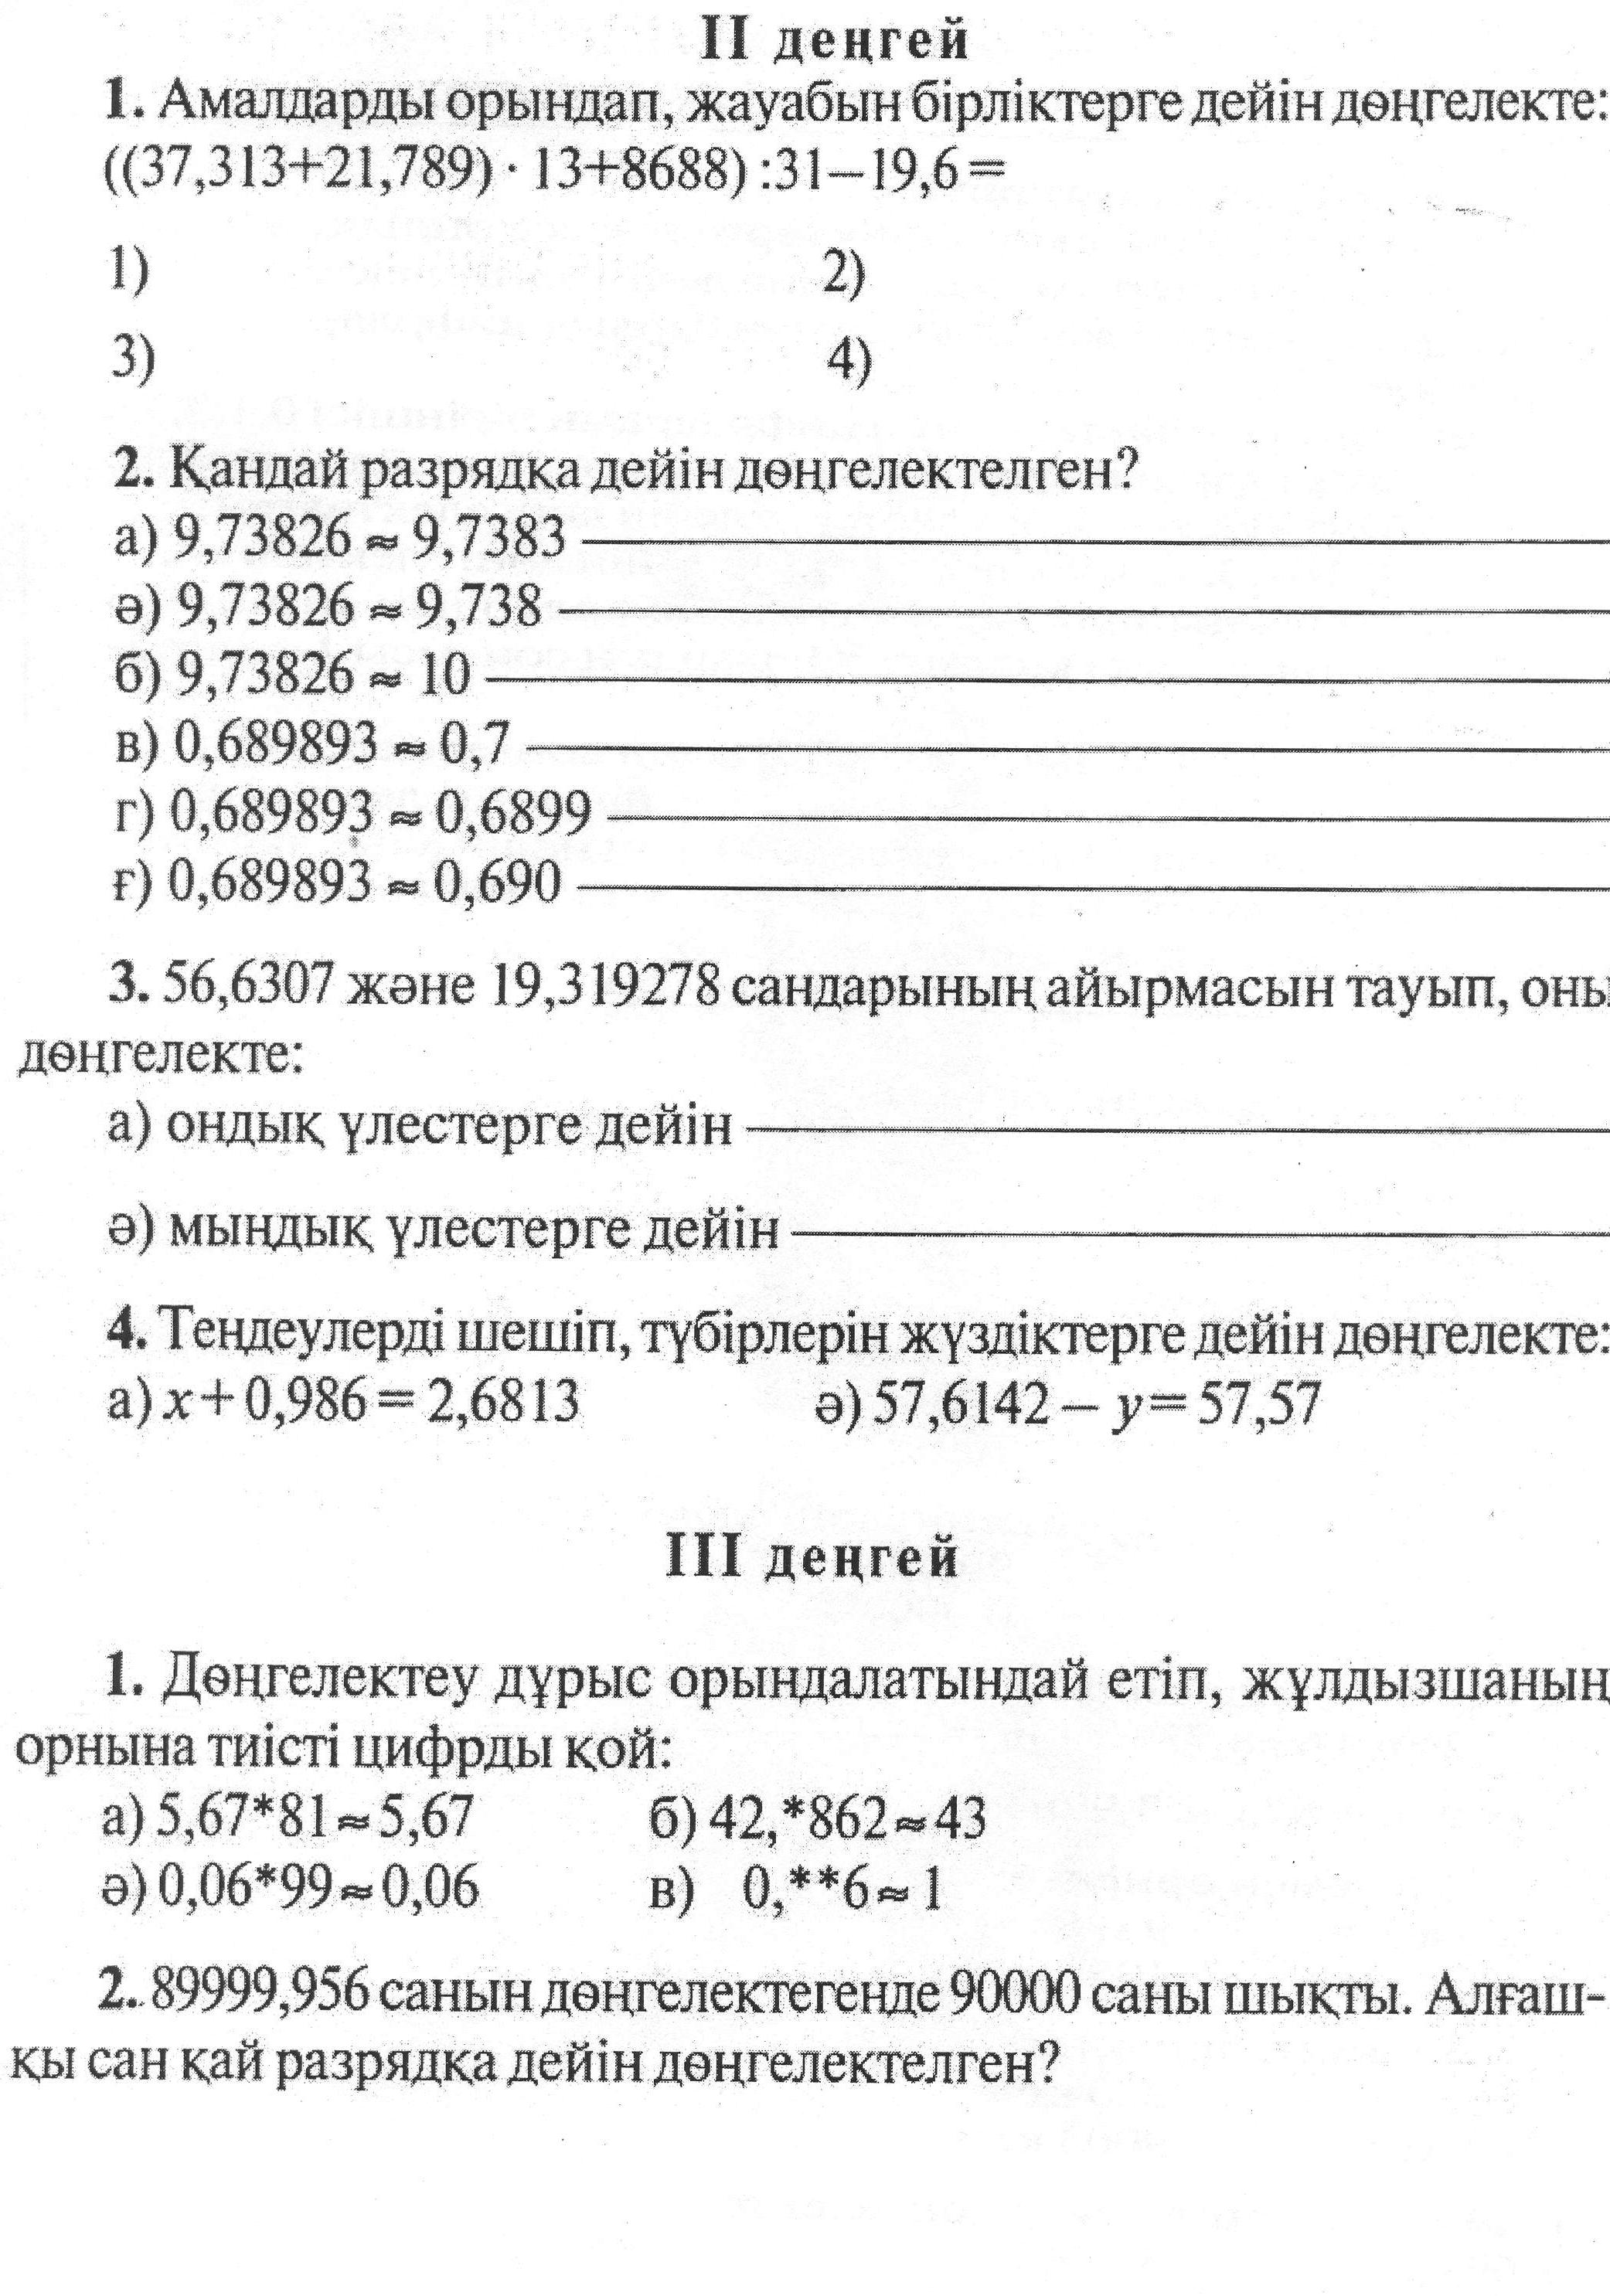 hello_html_m1c2cd926.jpg